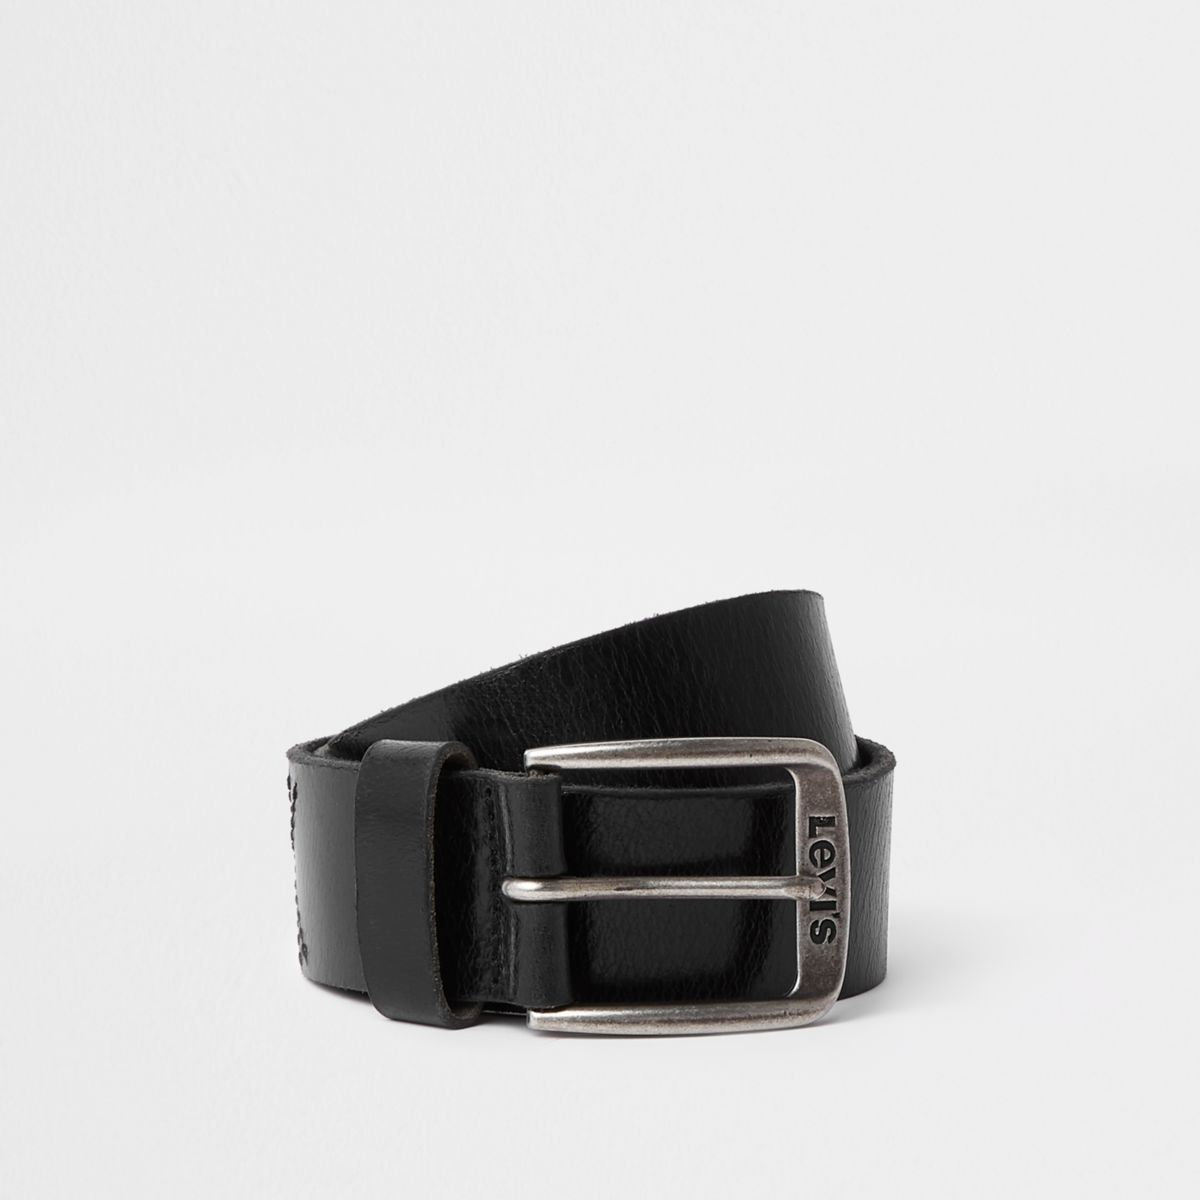 Levi's black leather buckle belt